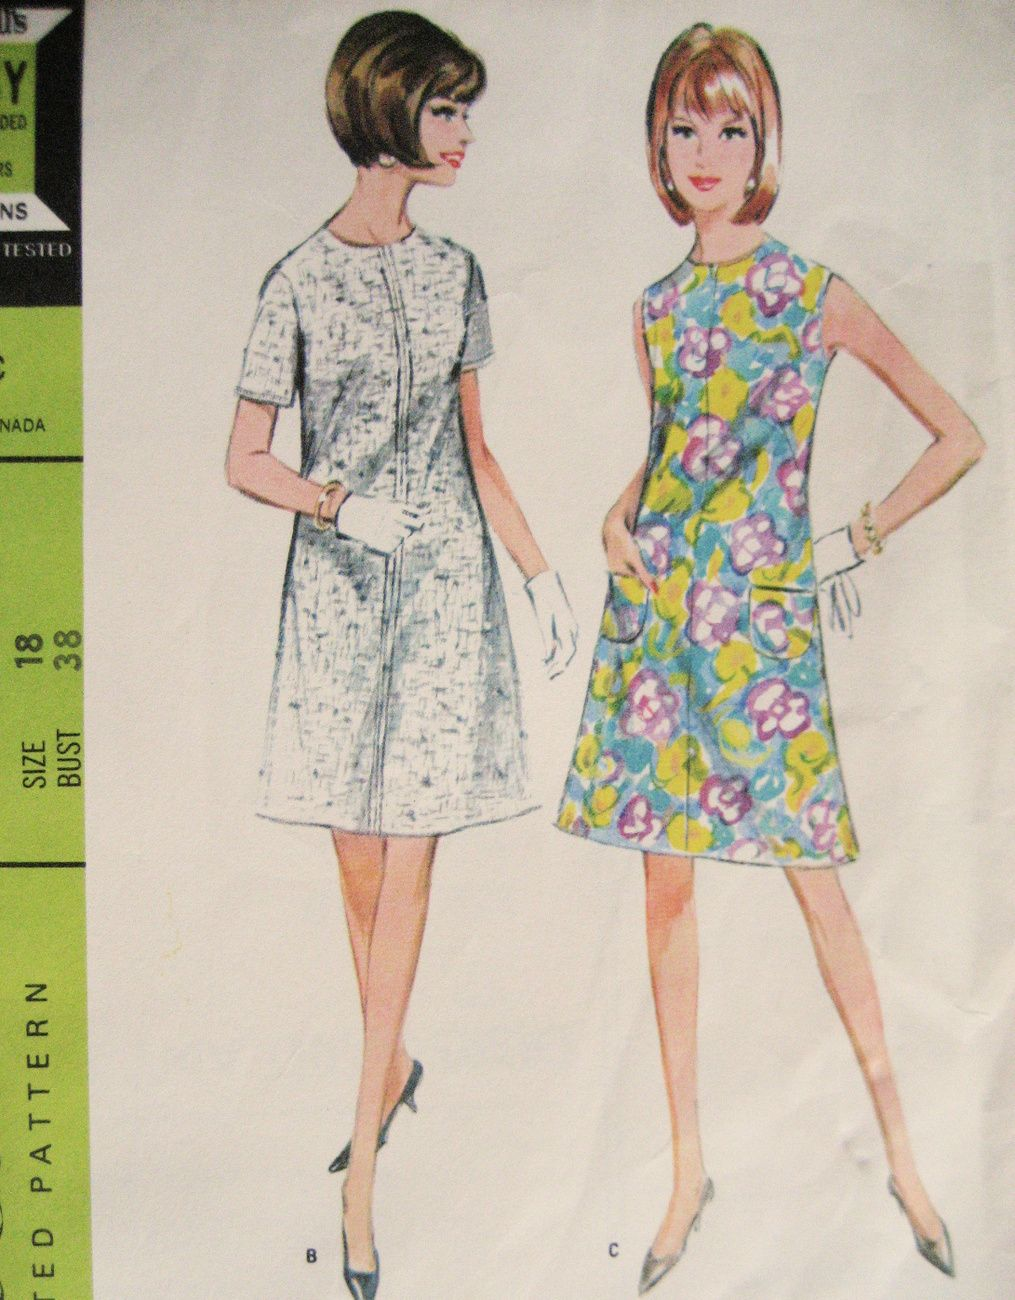 Mccalls 8592 Vintage Unused Womens 60s Pattern Size 18 Bust 38 Shift Dress Vintage Shift Dress Vintage Outfits Womens Shift Dresses [ 1300 x 1015 Pixel ]